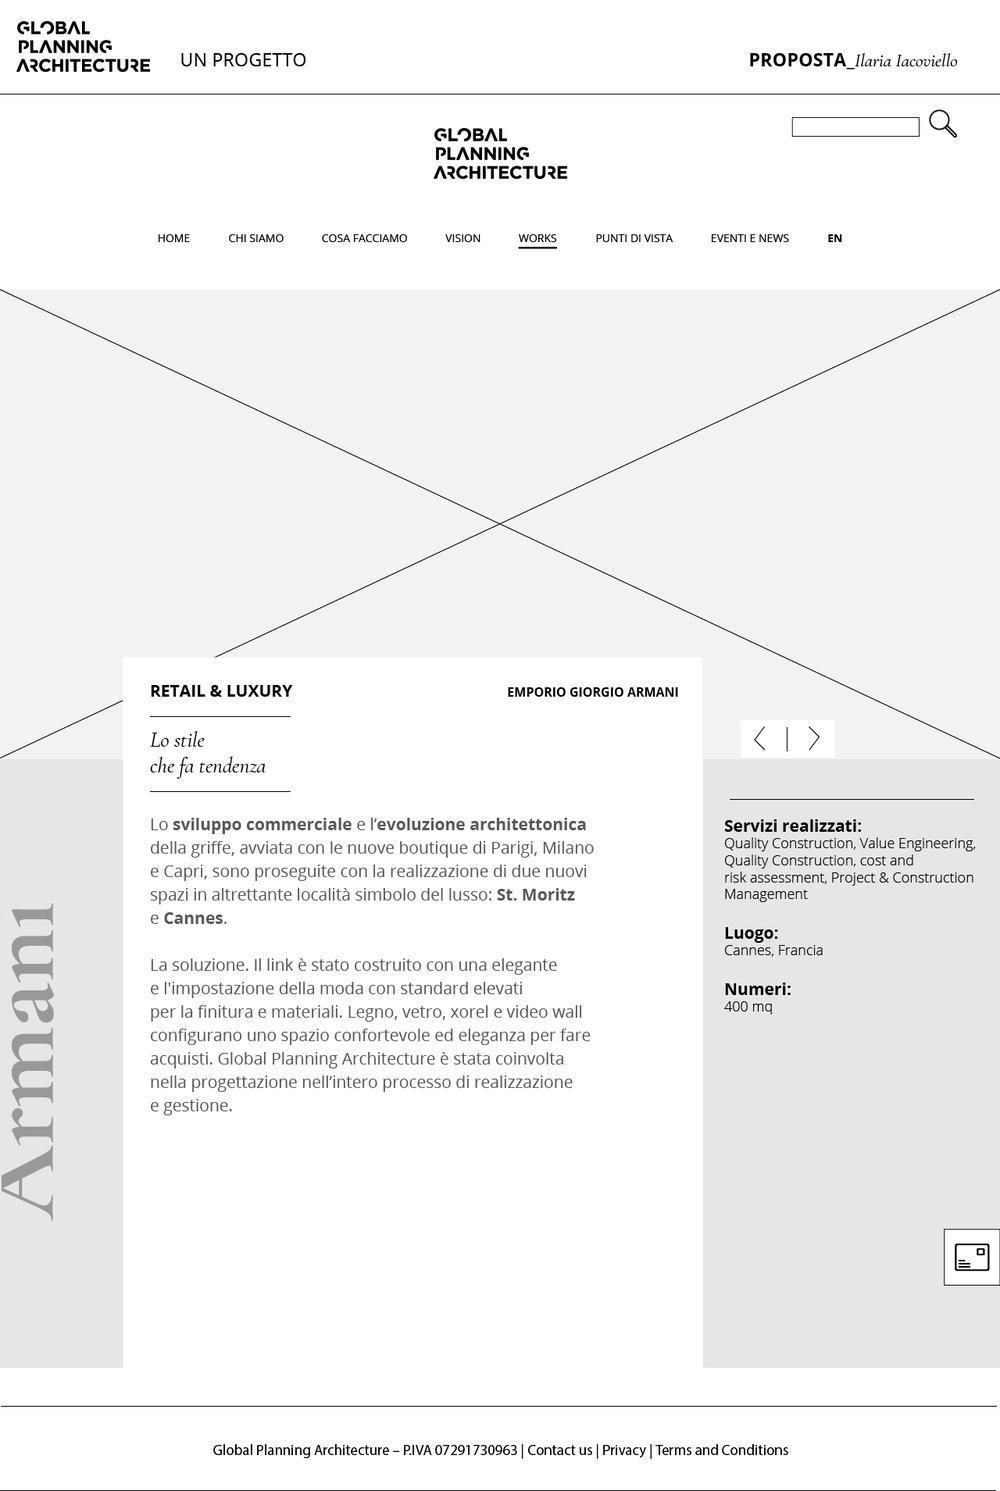 GPA_02_pagina_progetto.png